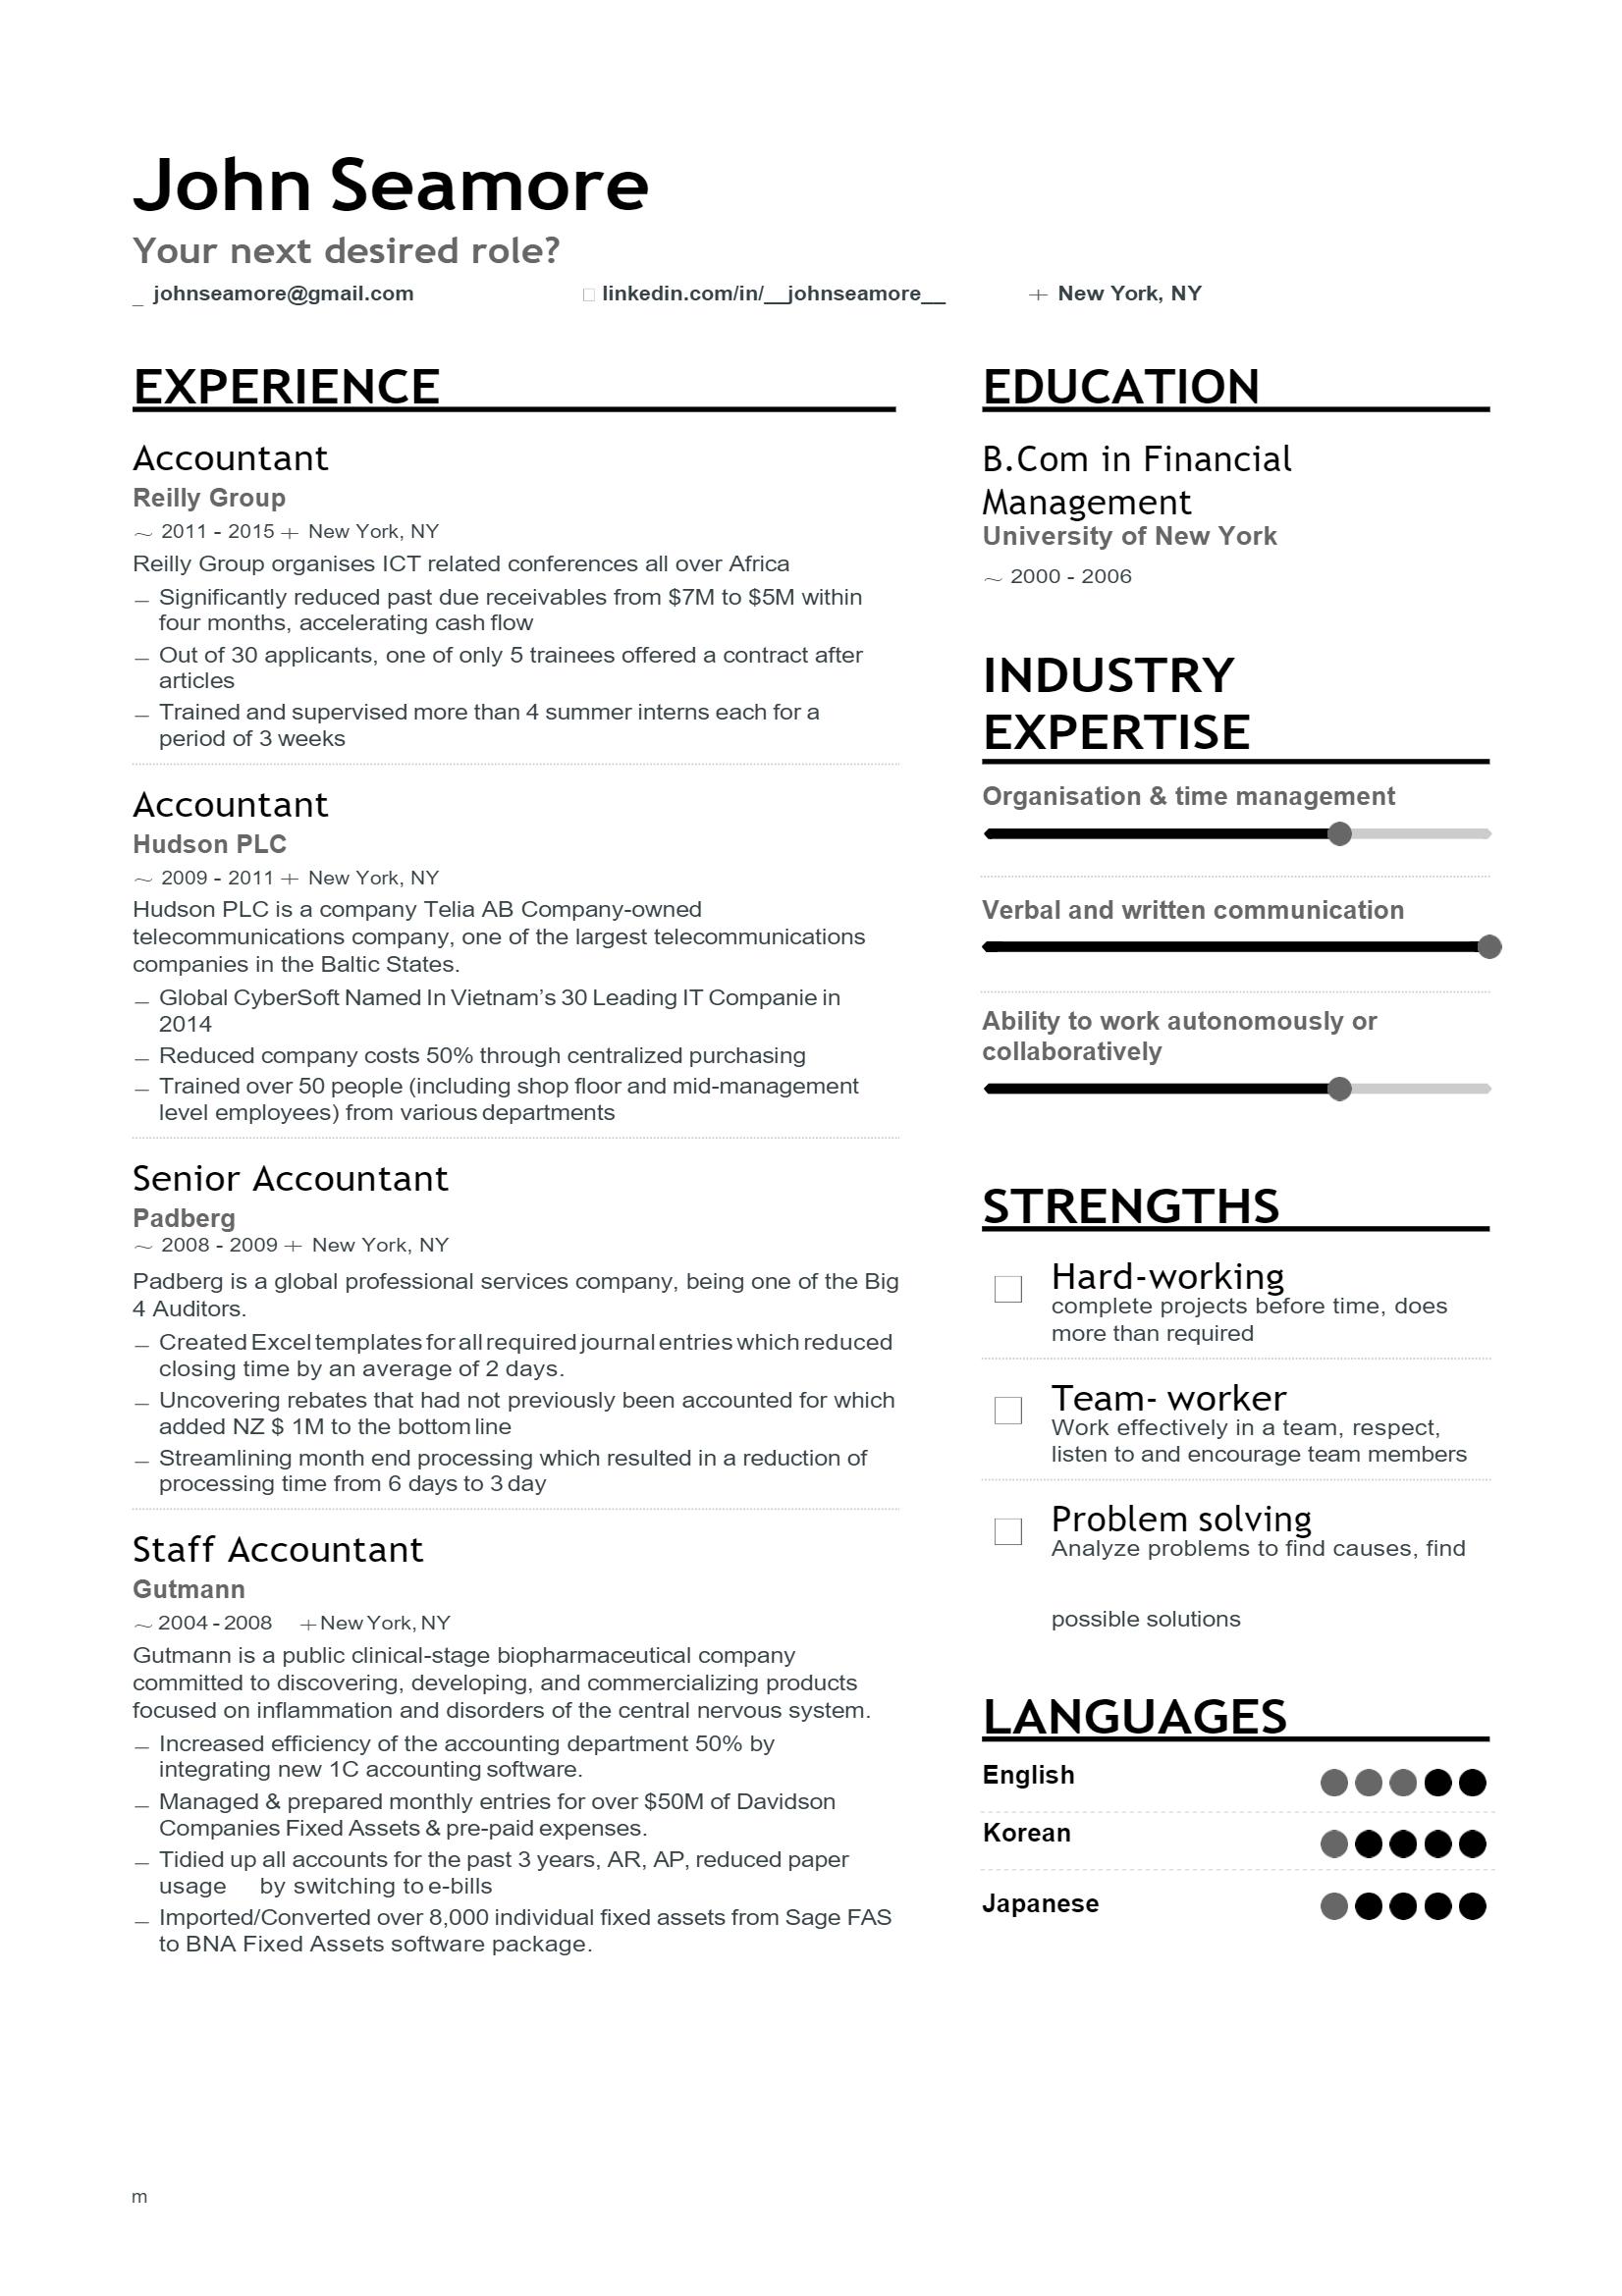 Accountant Resume > Accountant Resume .Docx (Word)